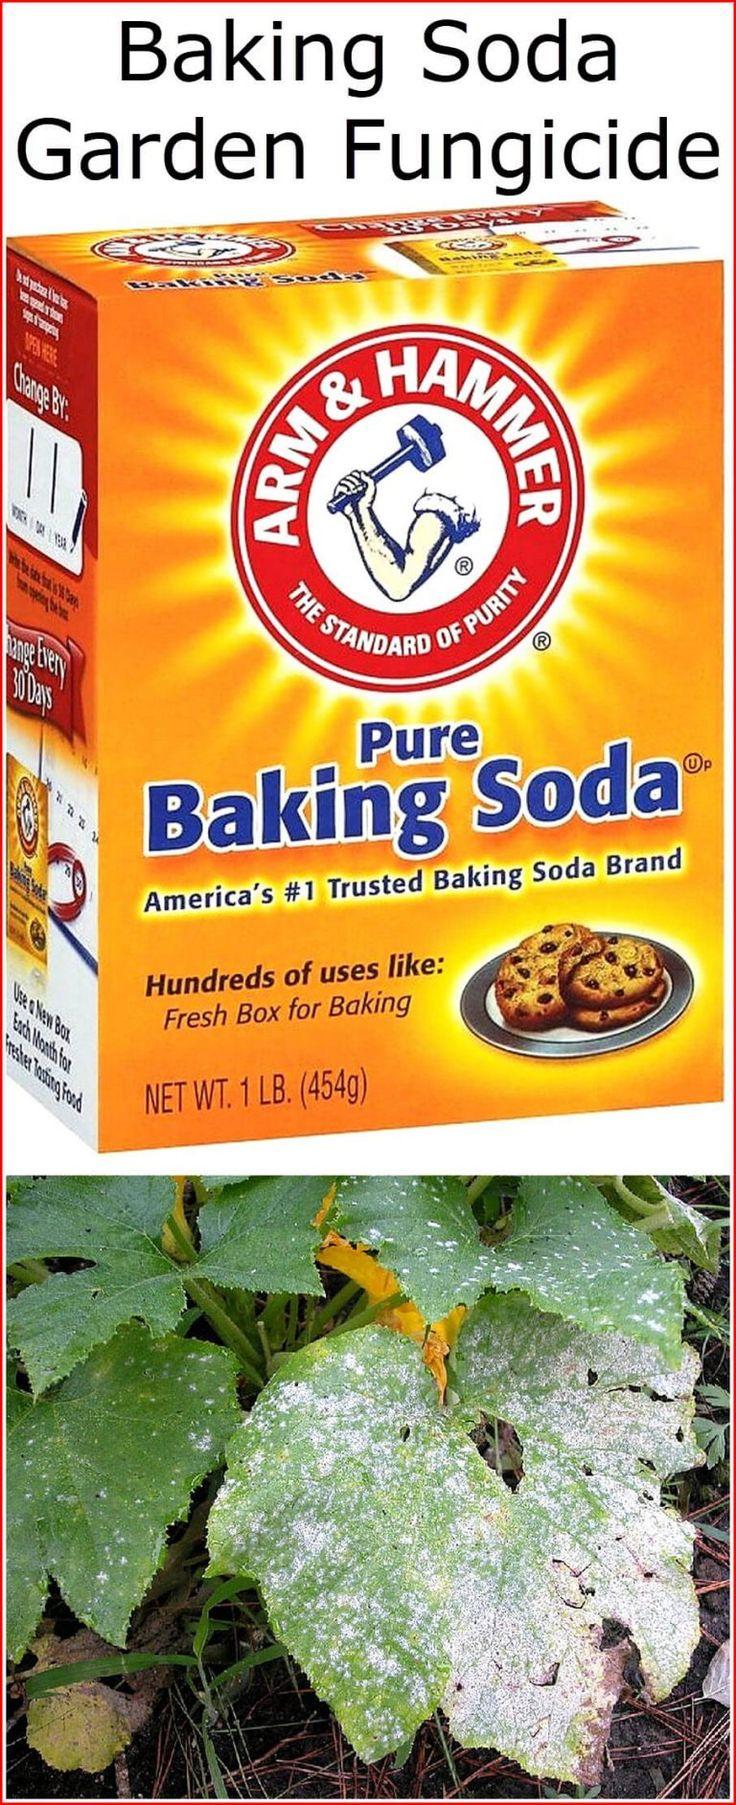 Baking Soda Garden Fungicide Powdery Mildew Fungicide 400 x 300